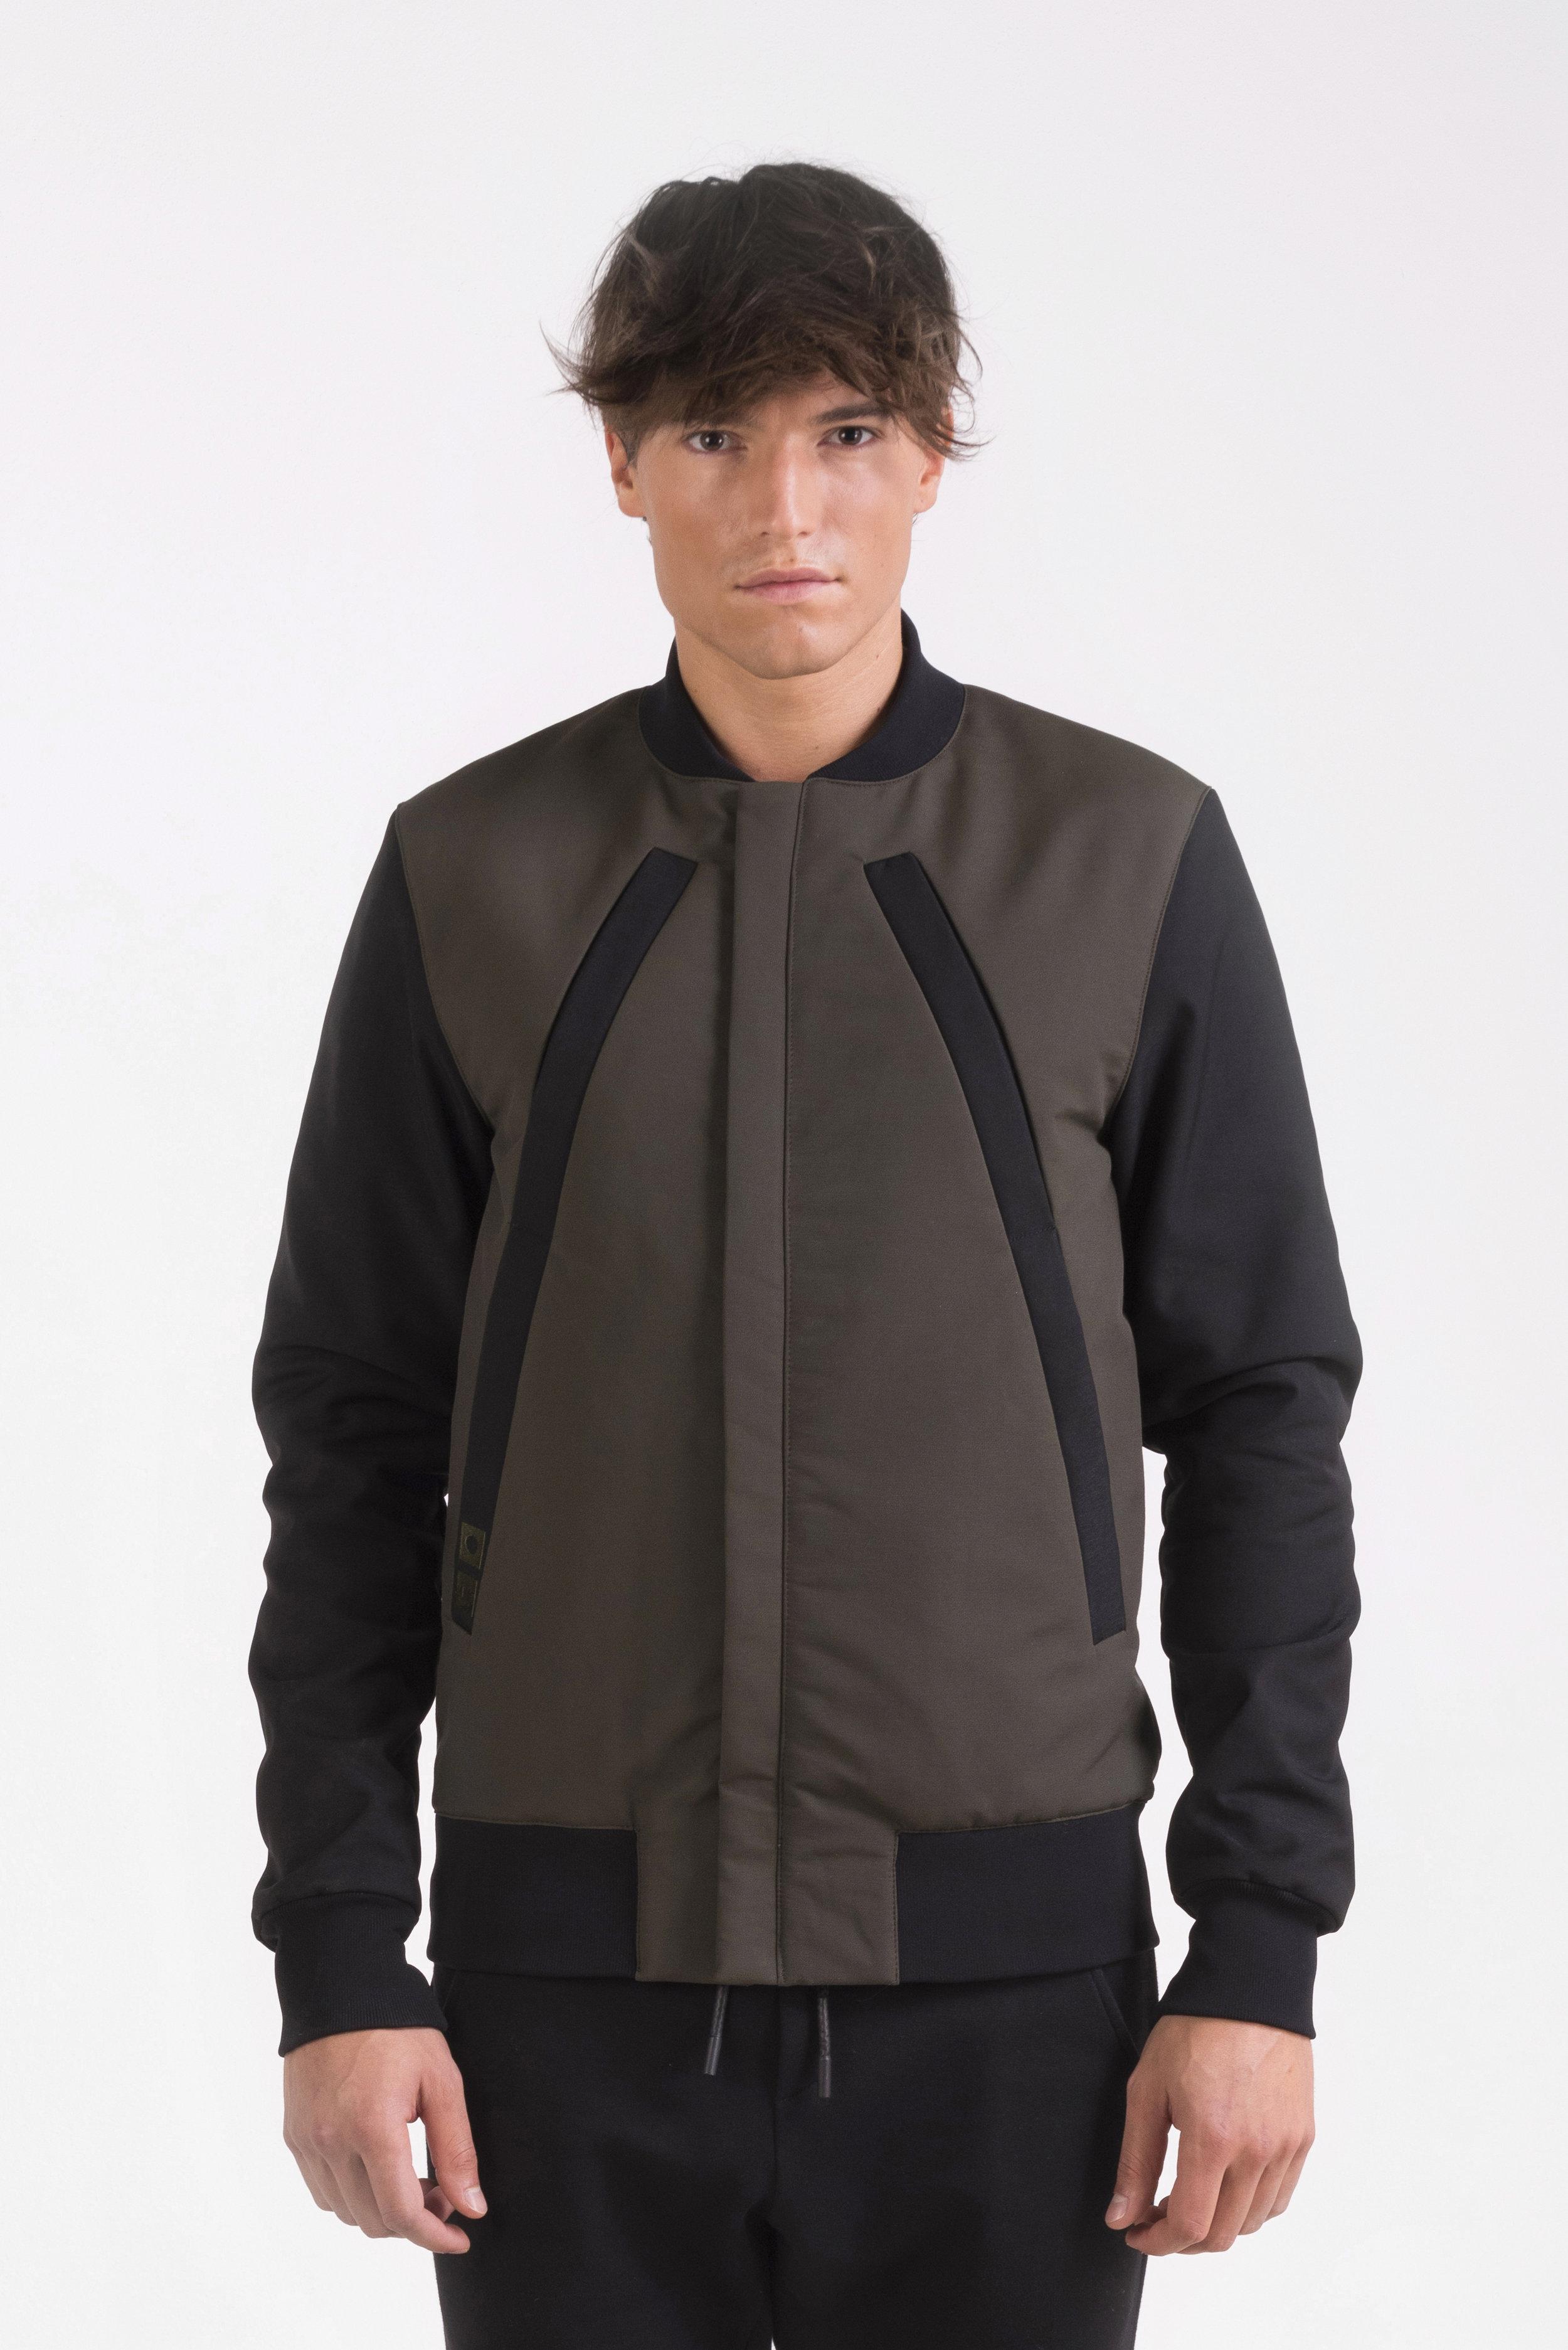 oneculture Bomber jacket kaki 2.jpg